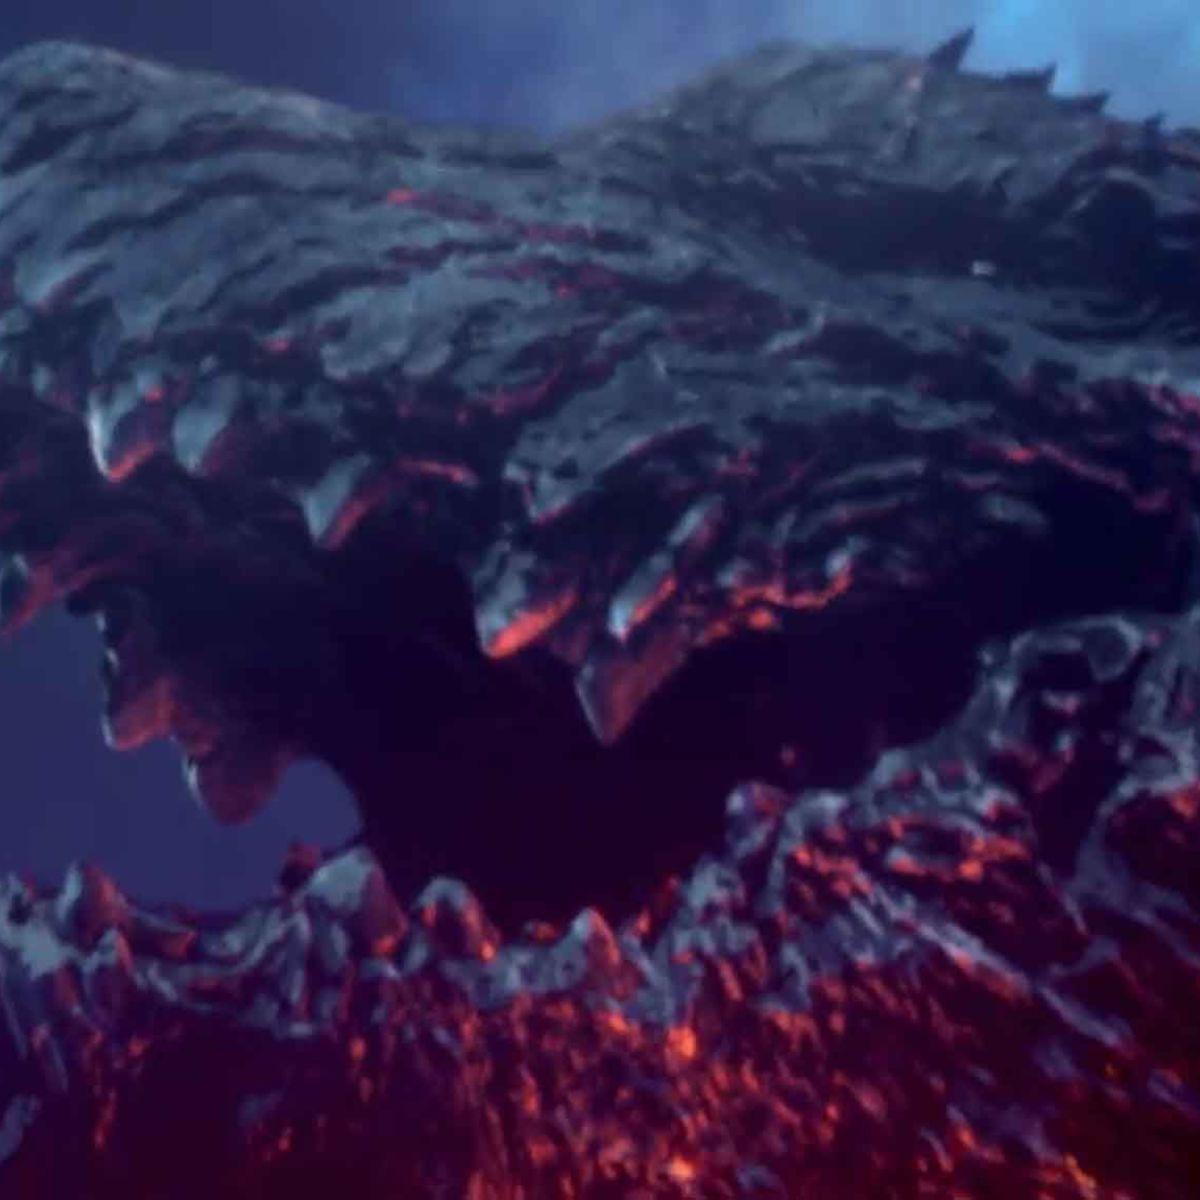 Anime On Netflix 2018: Netflix's Godzilla Anime's Second Chapter Is An Oxygen